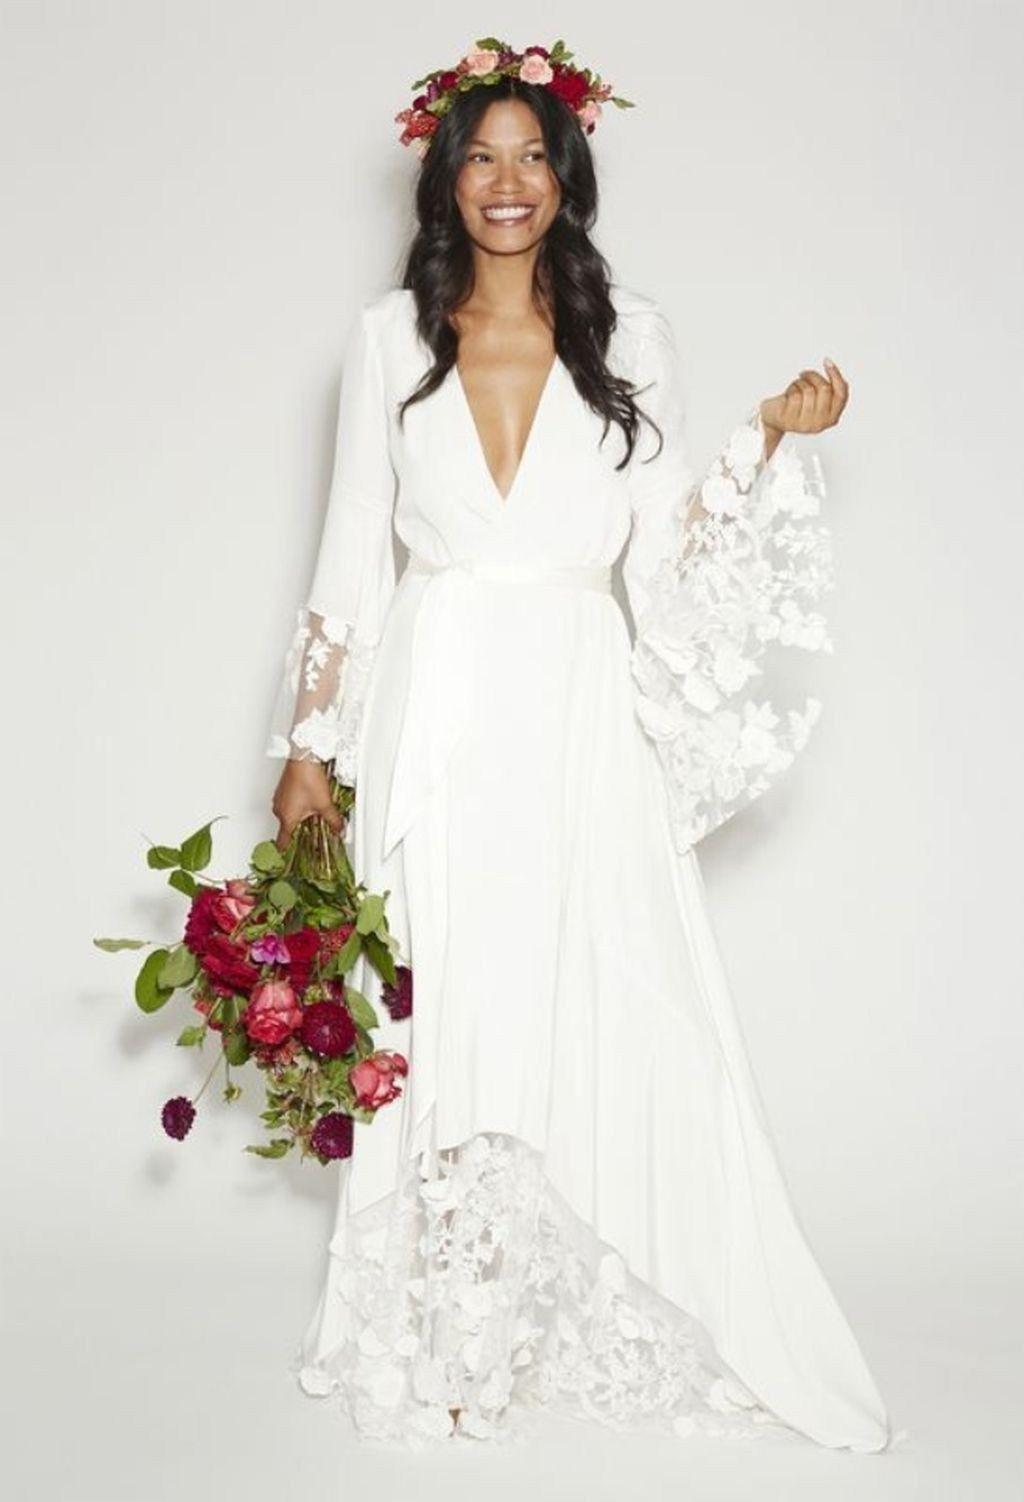 Beautiful non traditional wedding dress ideas pinterest